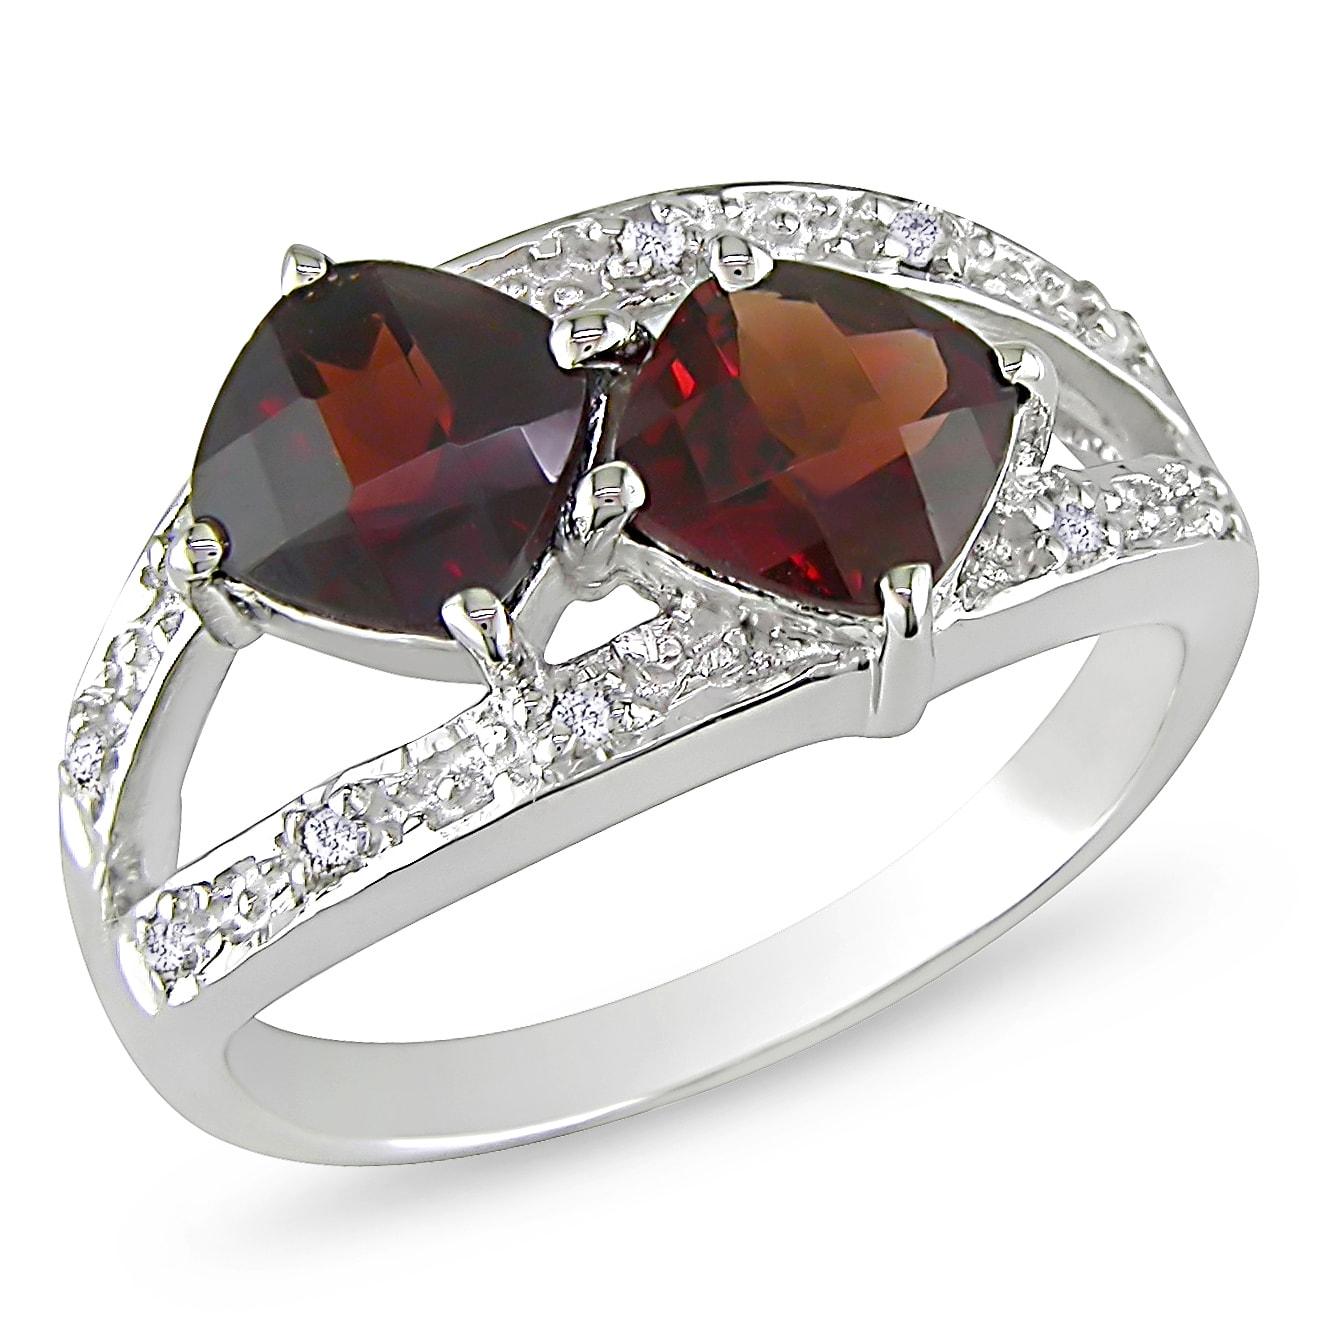 Miadora Sterling Silver Garnet and Diamond Ring (G-H, I3)